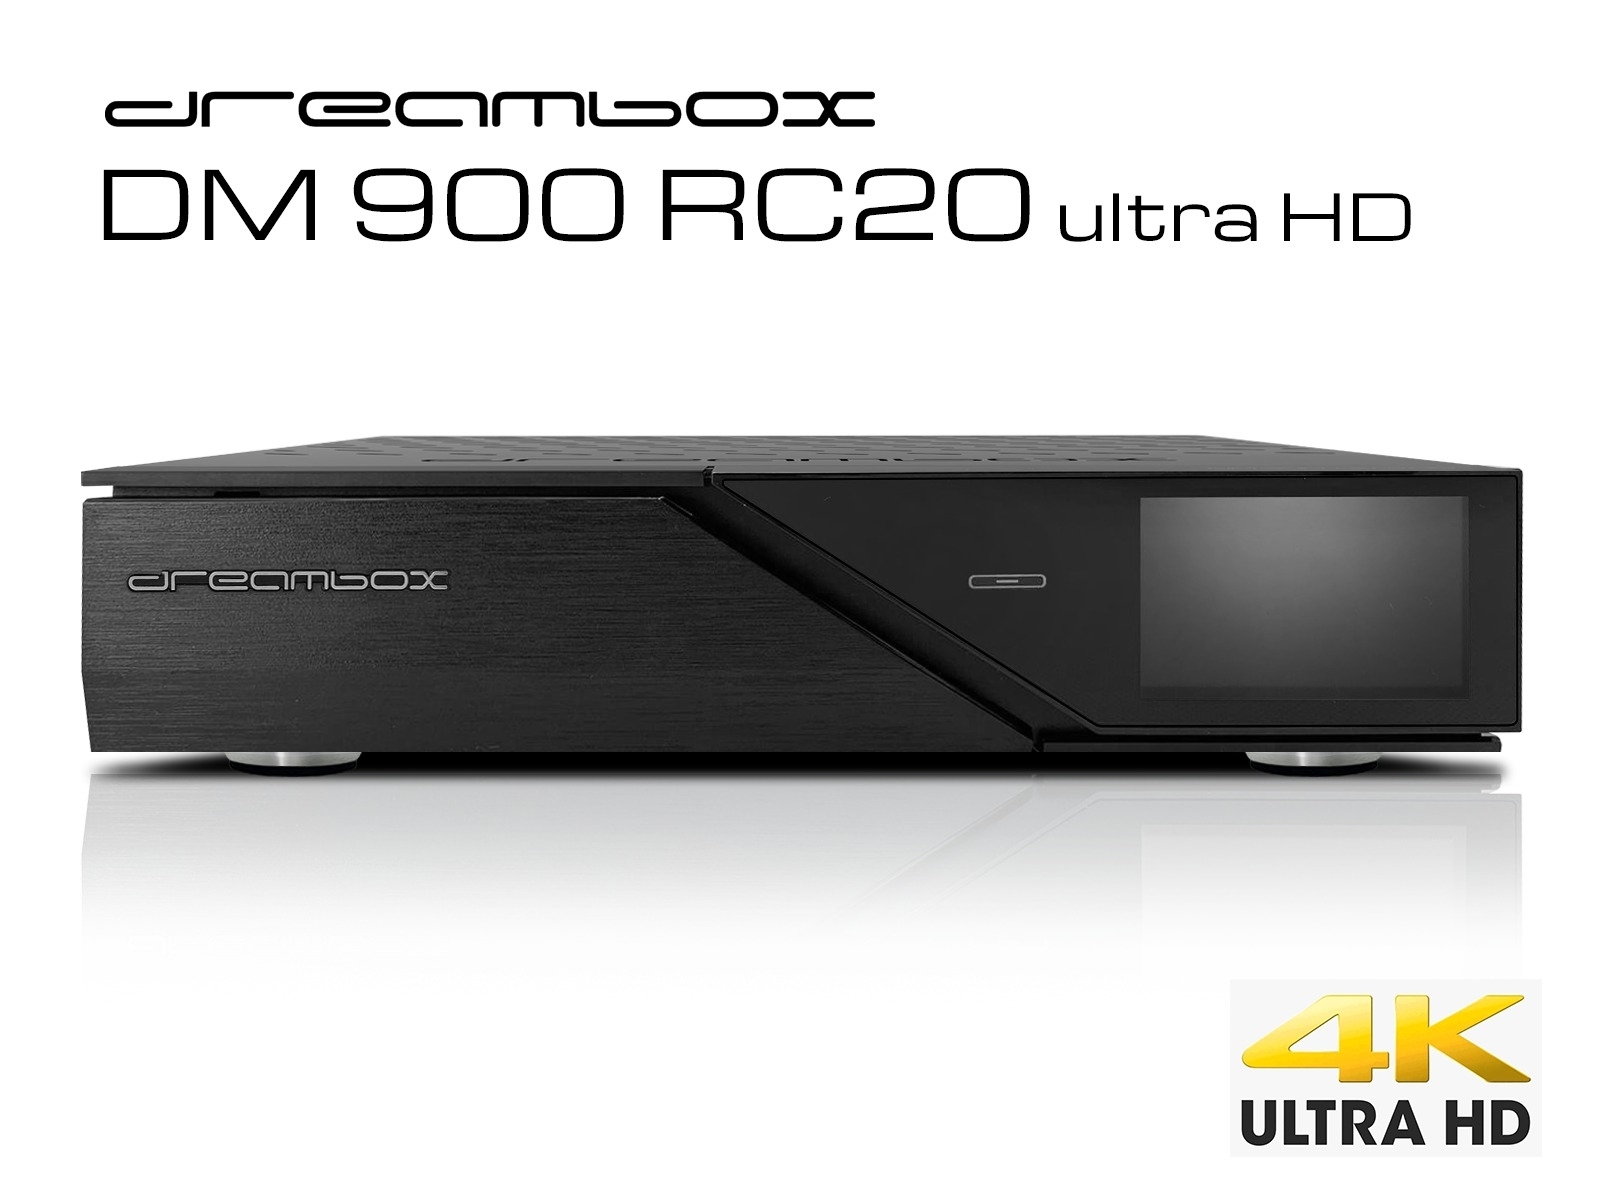 Dreambox DM900 RC20 UHD 4K 1x DVB-S2 FBC Twin Tuner E2 Linux PVR Receiver